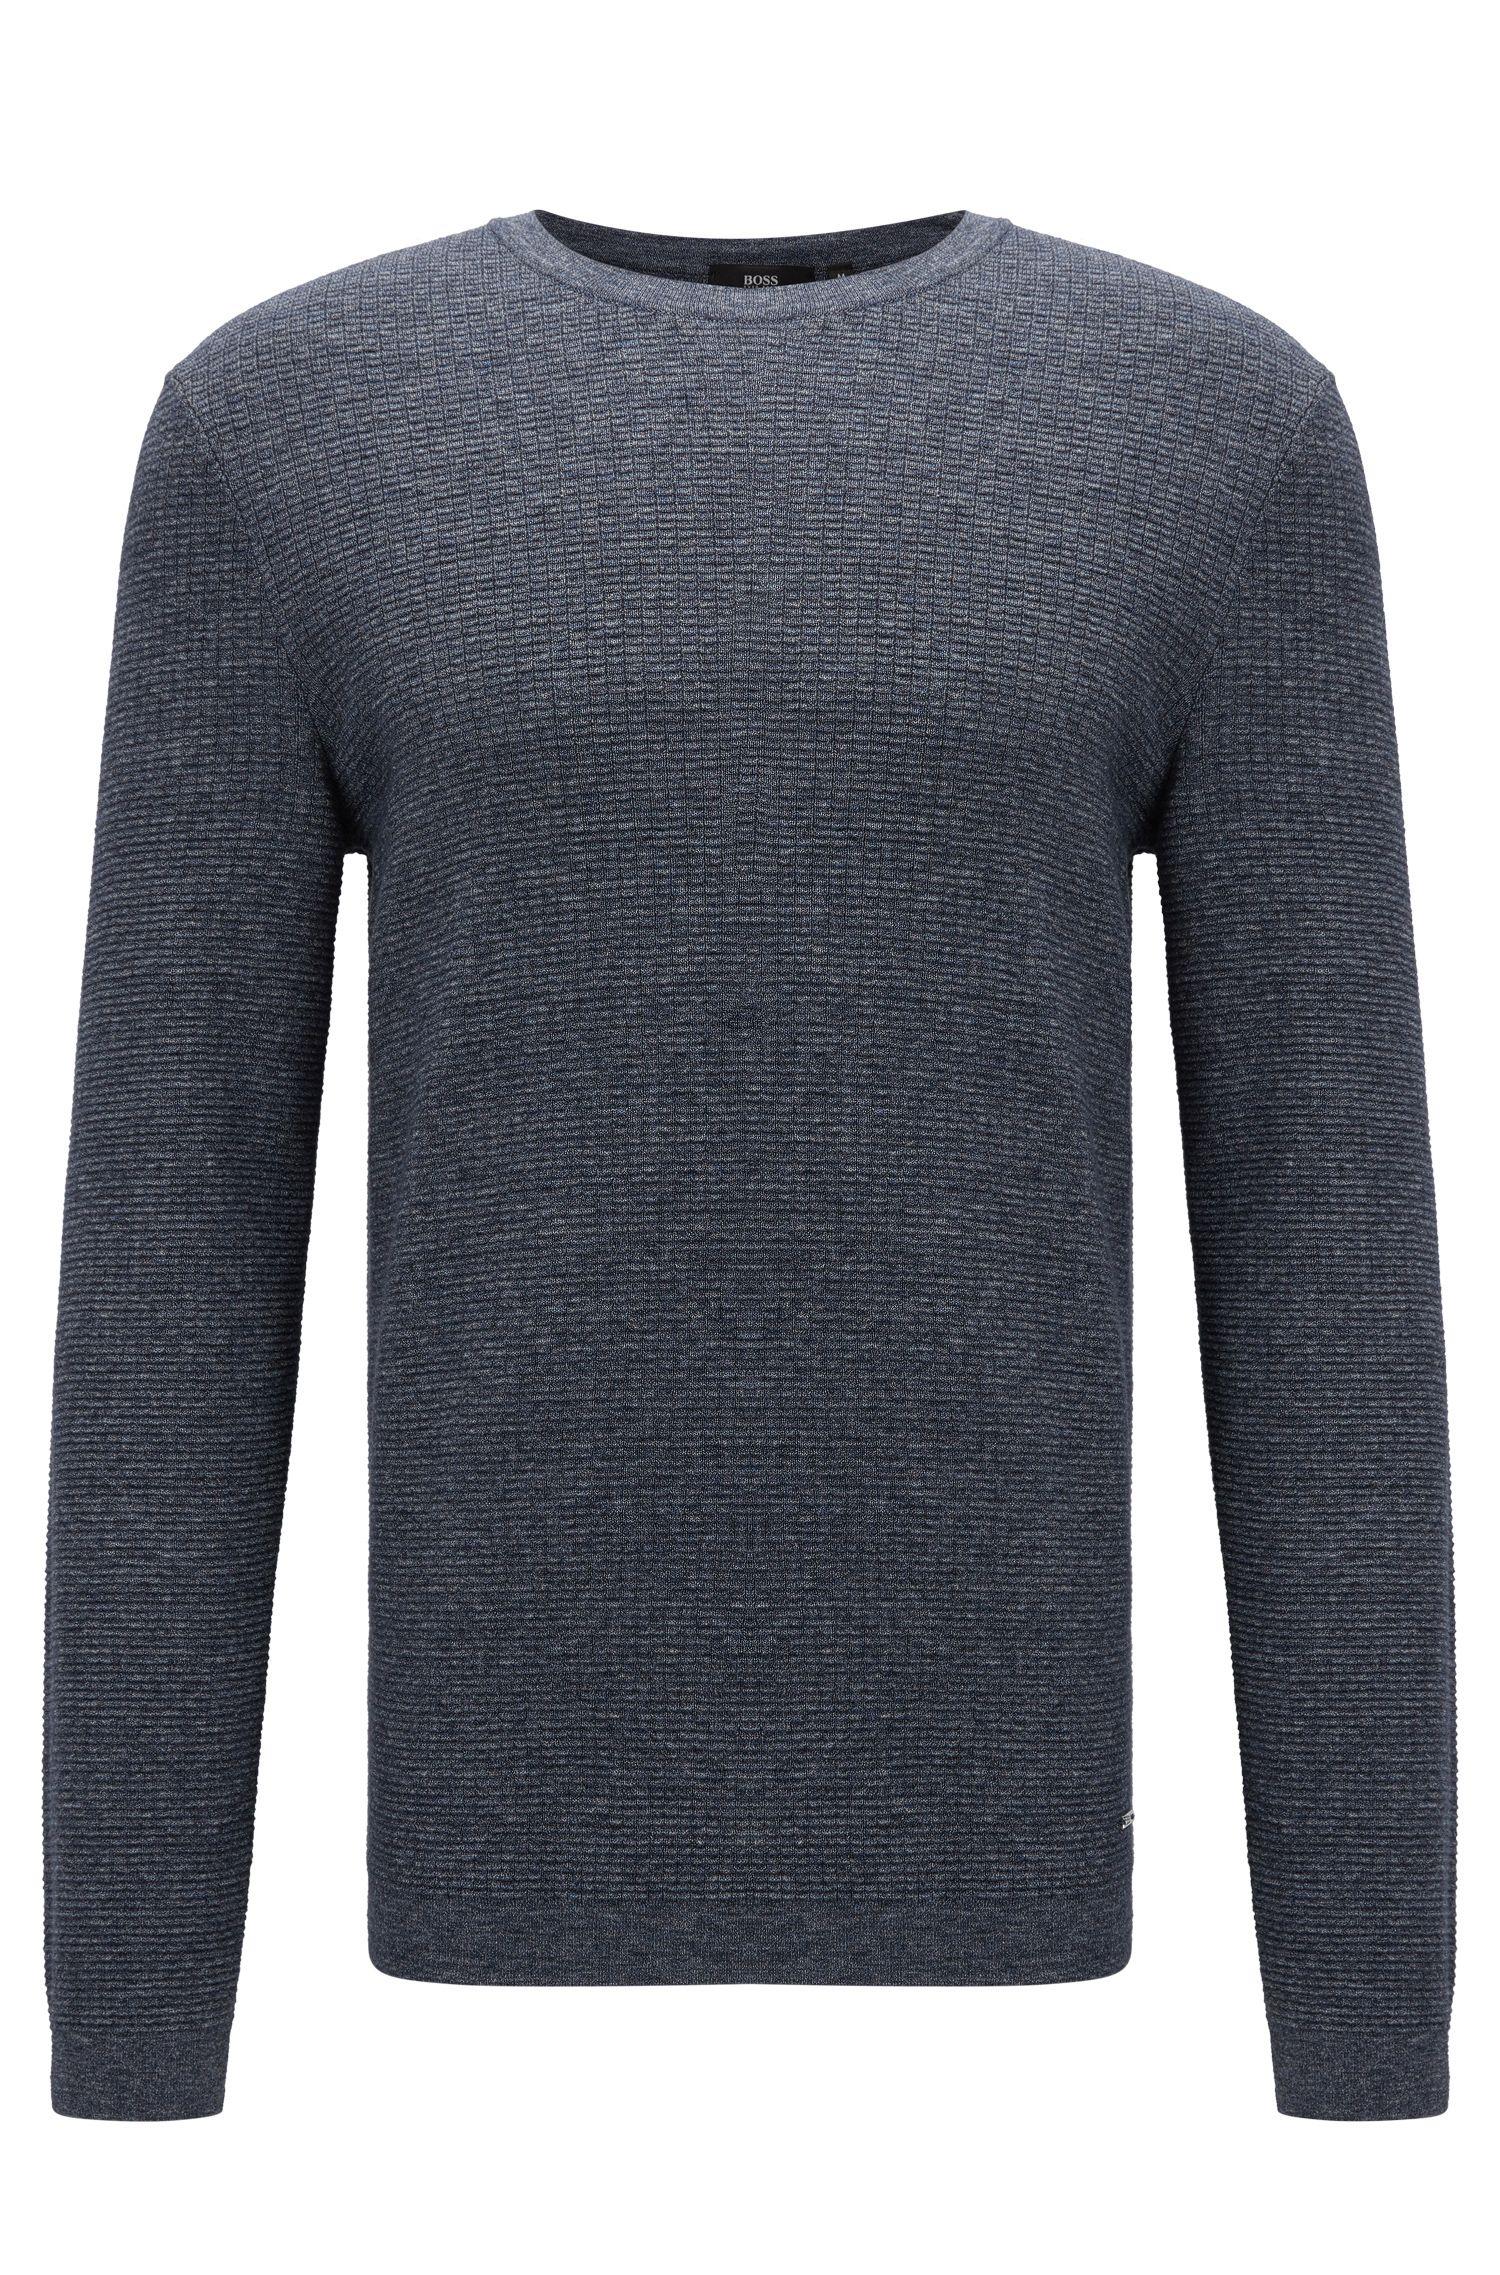 Slim-fit sweater in denim-look cotton